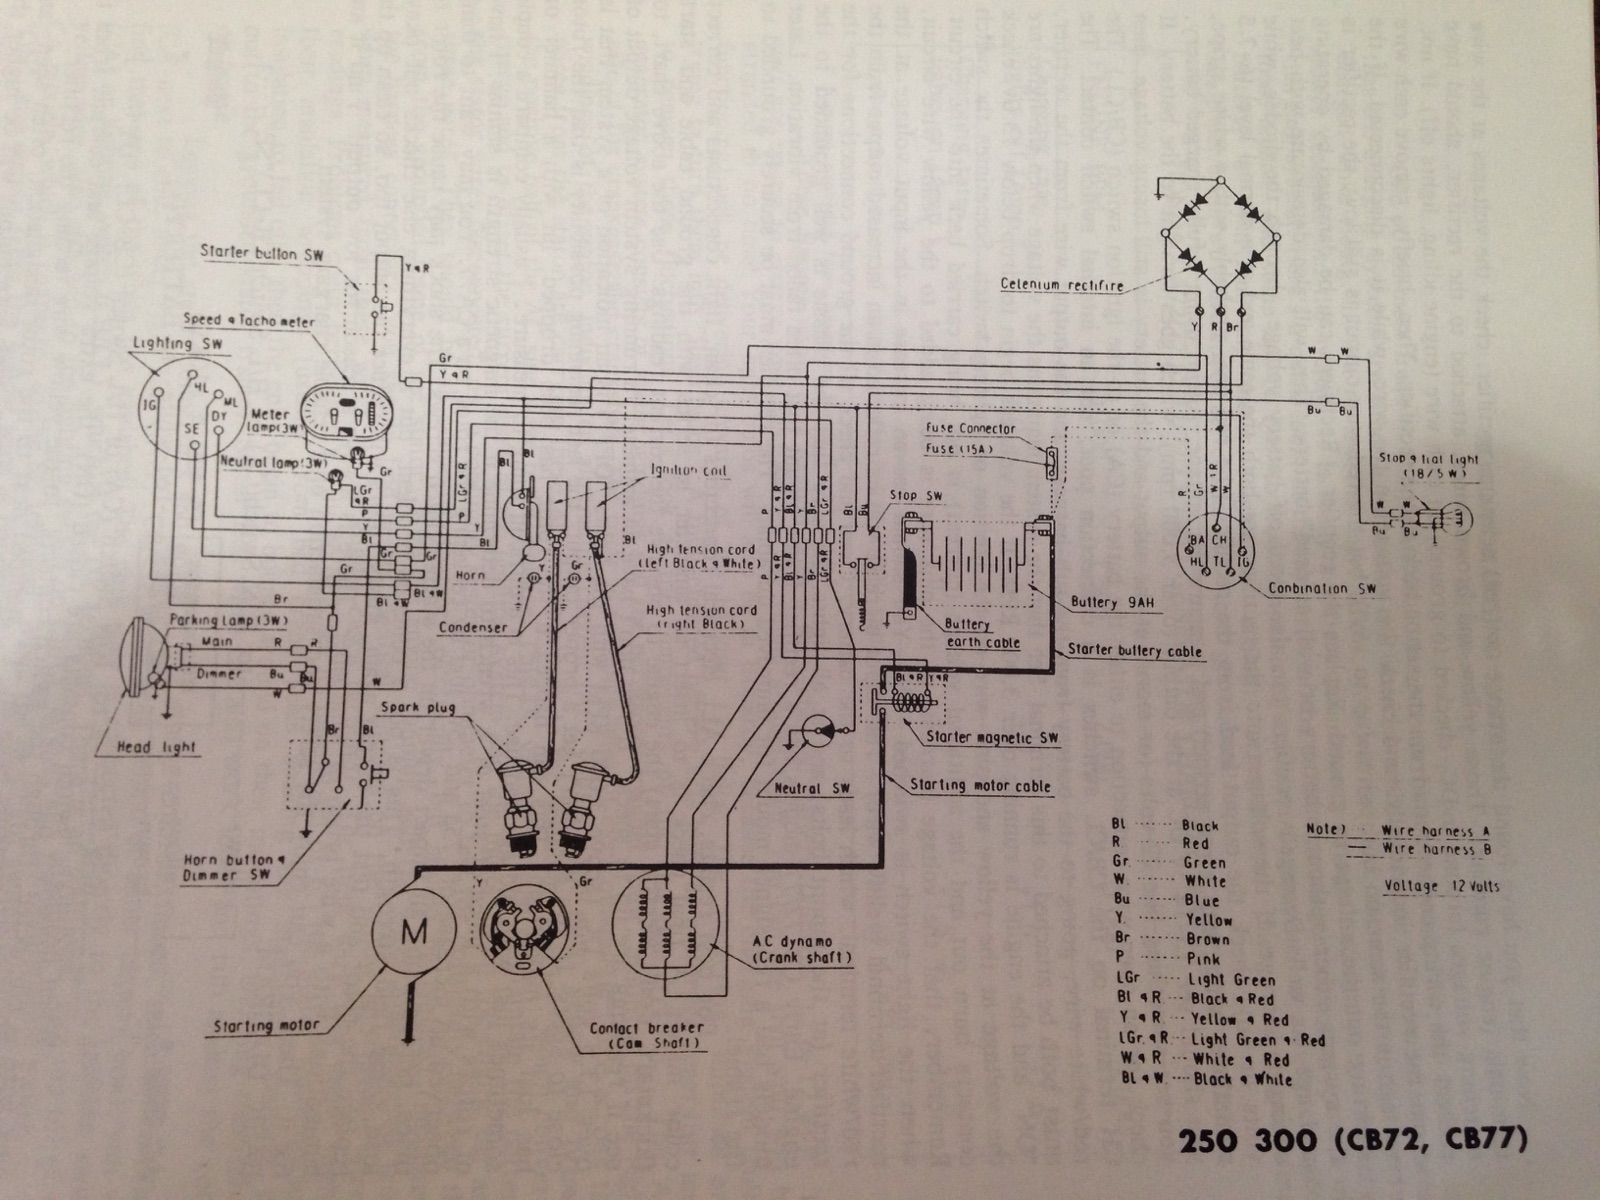 1978 honda xl175 wiring diagram 1976 honda xl175 wiring